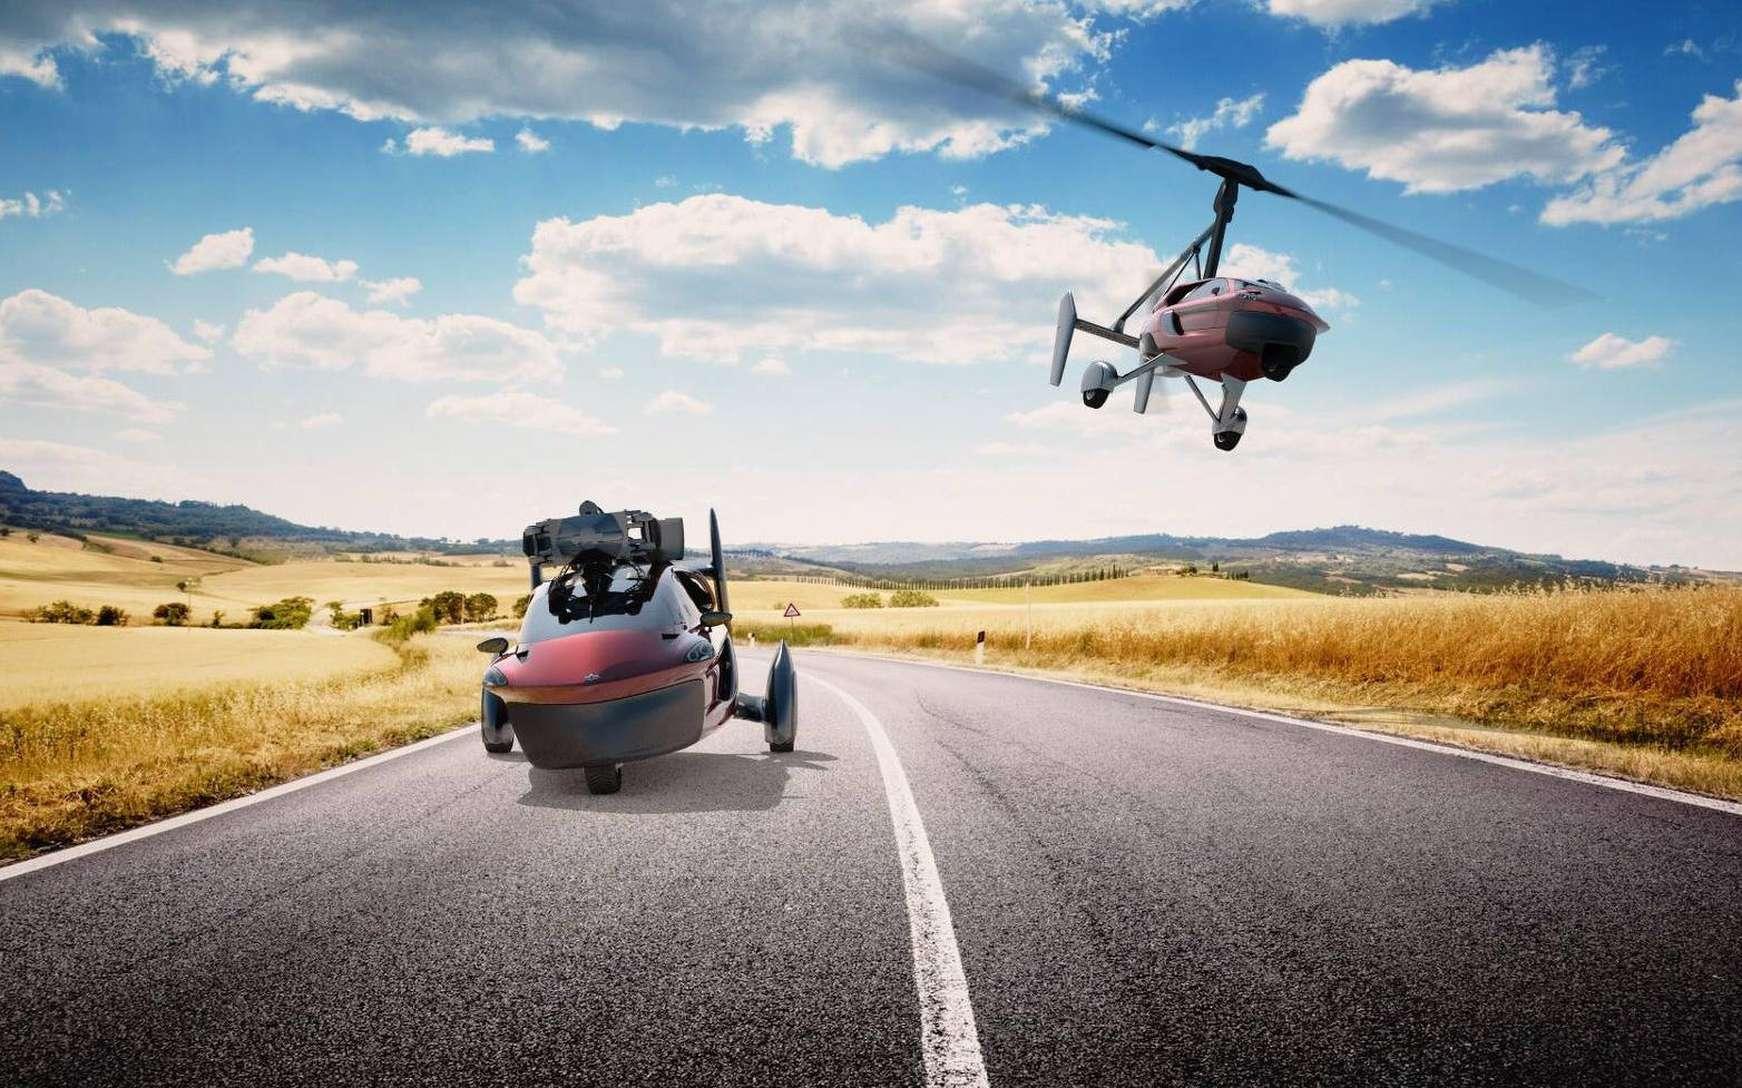 A car that flies, and a plane that drives